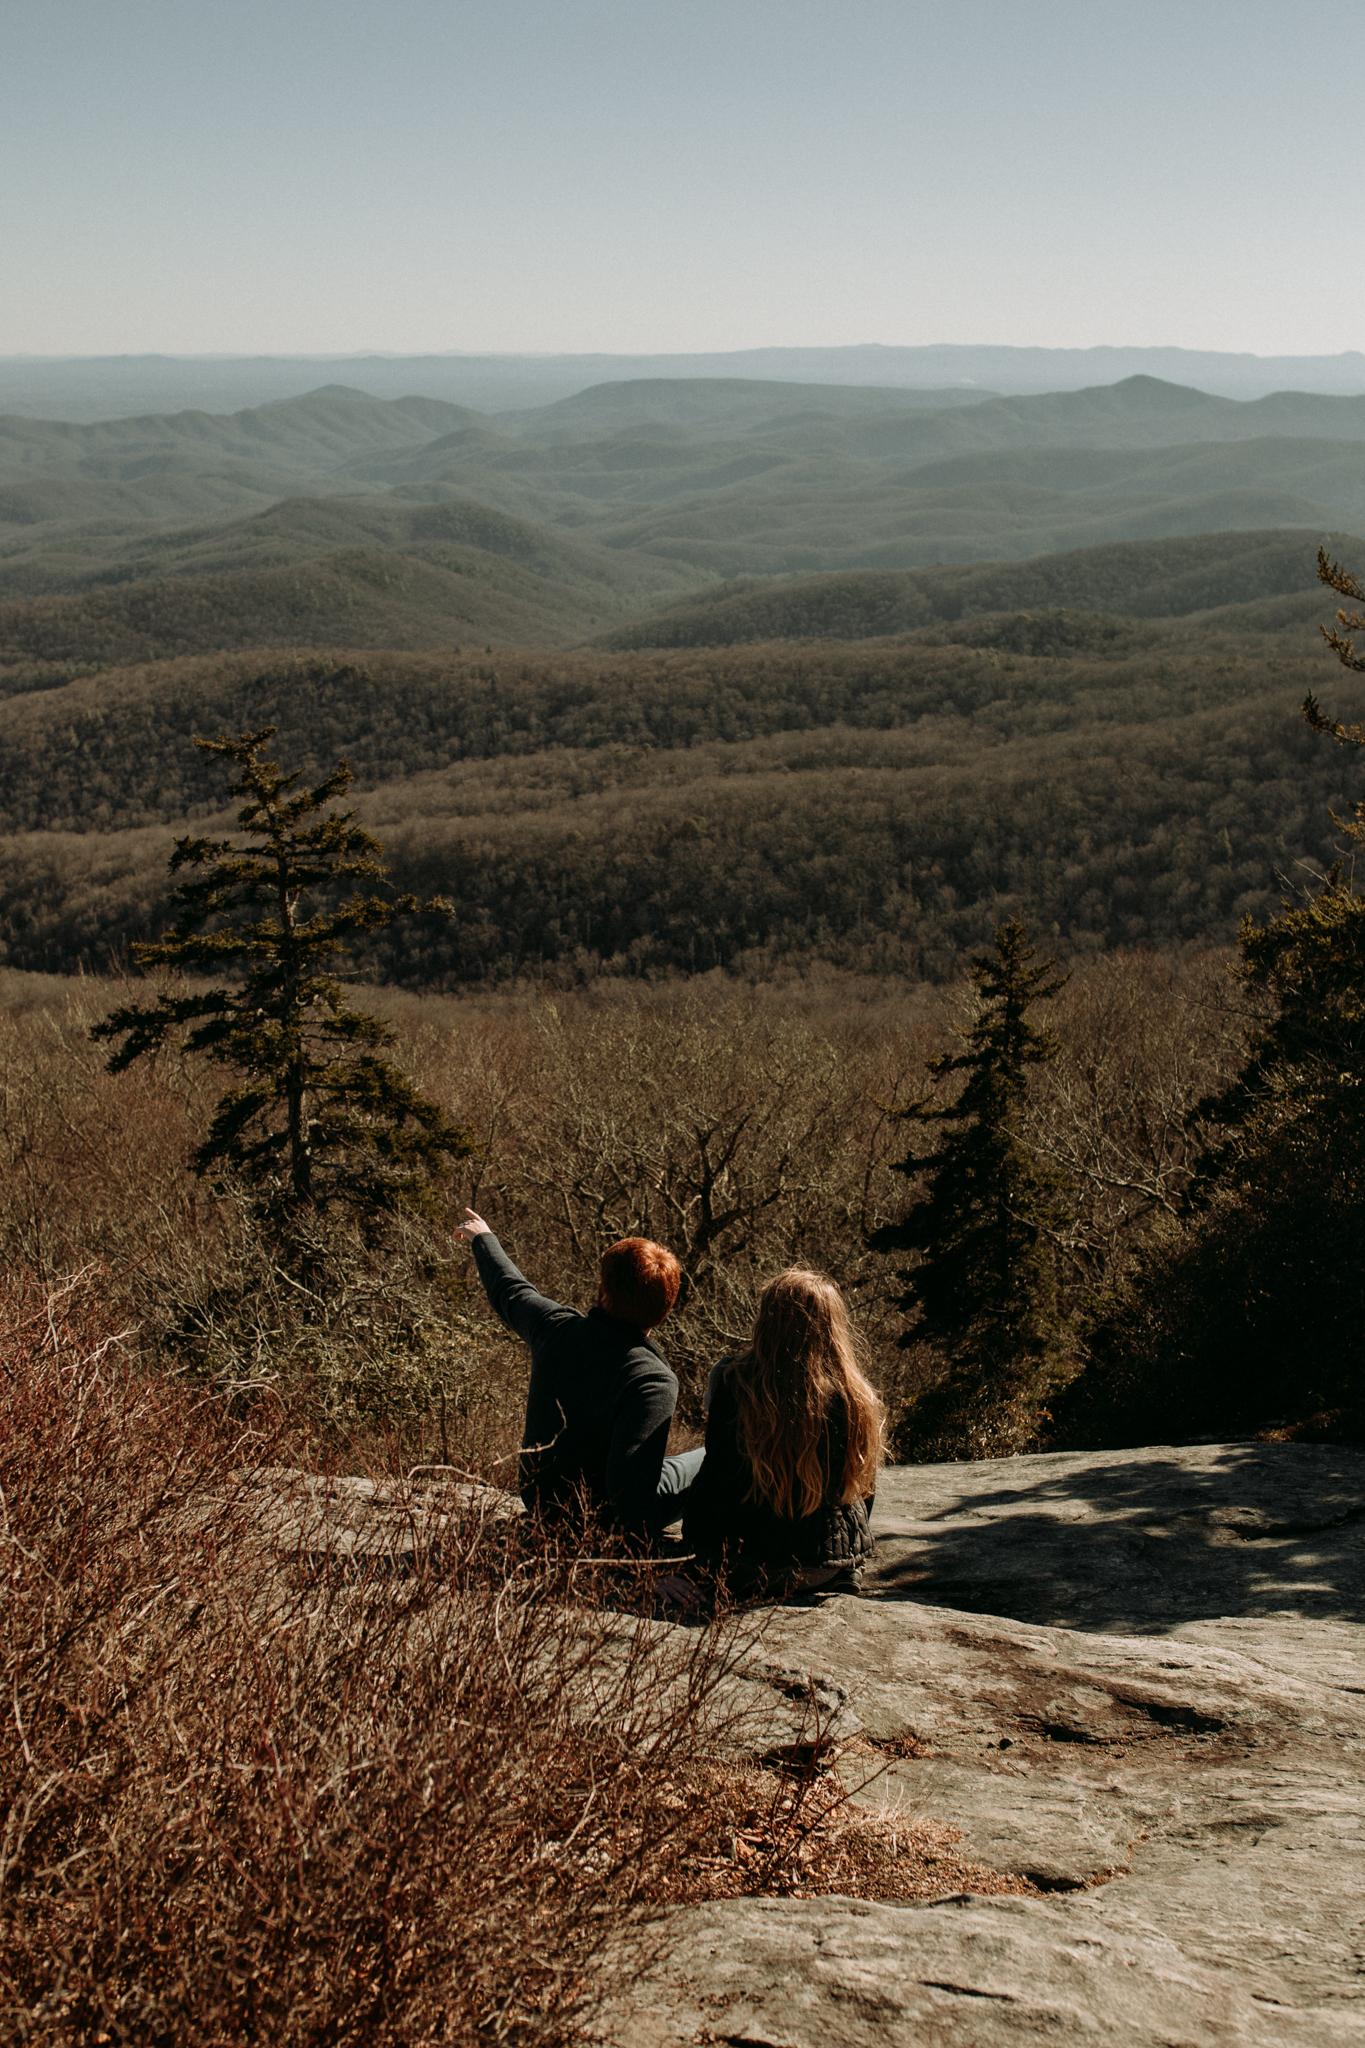 MonicaLeavellPhoto-AshleyMitch-NorthCarolina-Adventure-Engagement-Photographer-4.jpg